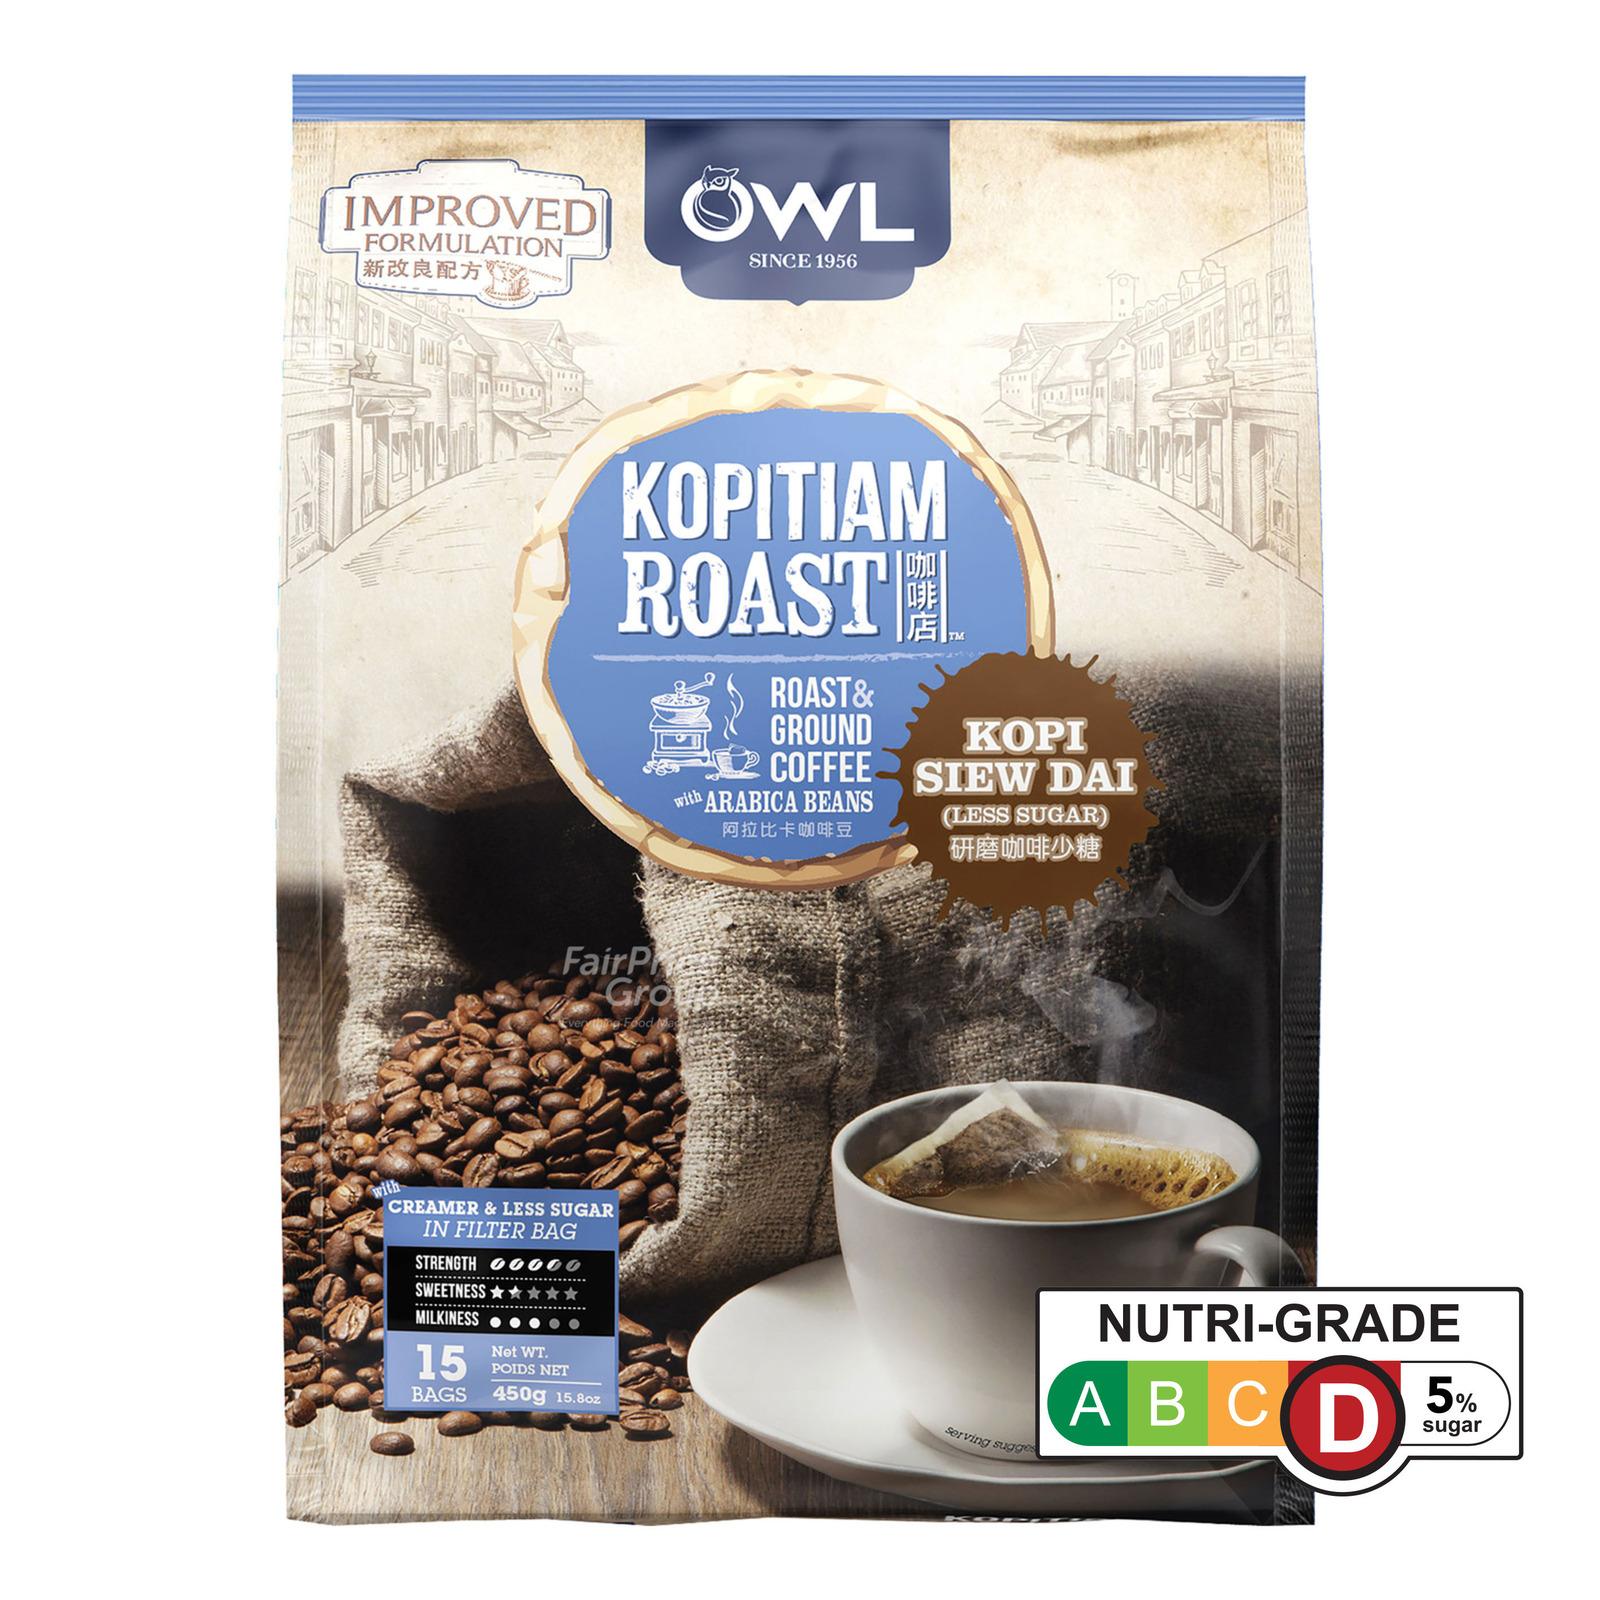 Owl Kopitiam Roast & Ground Coffee Bags - Kopi Siew Dai